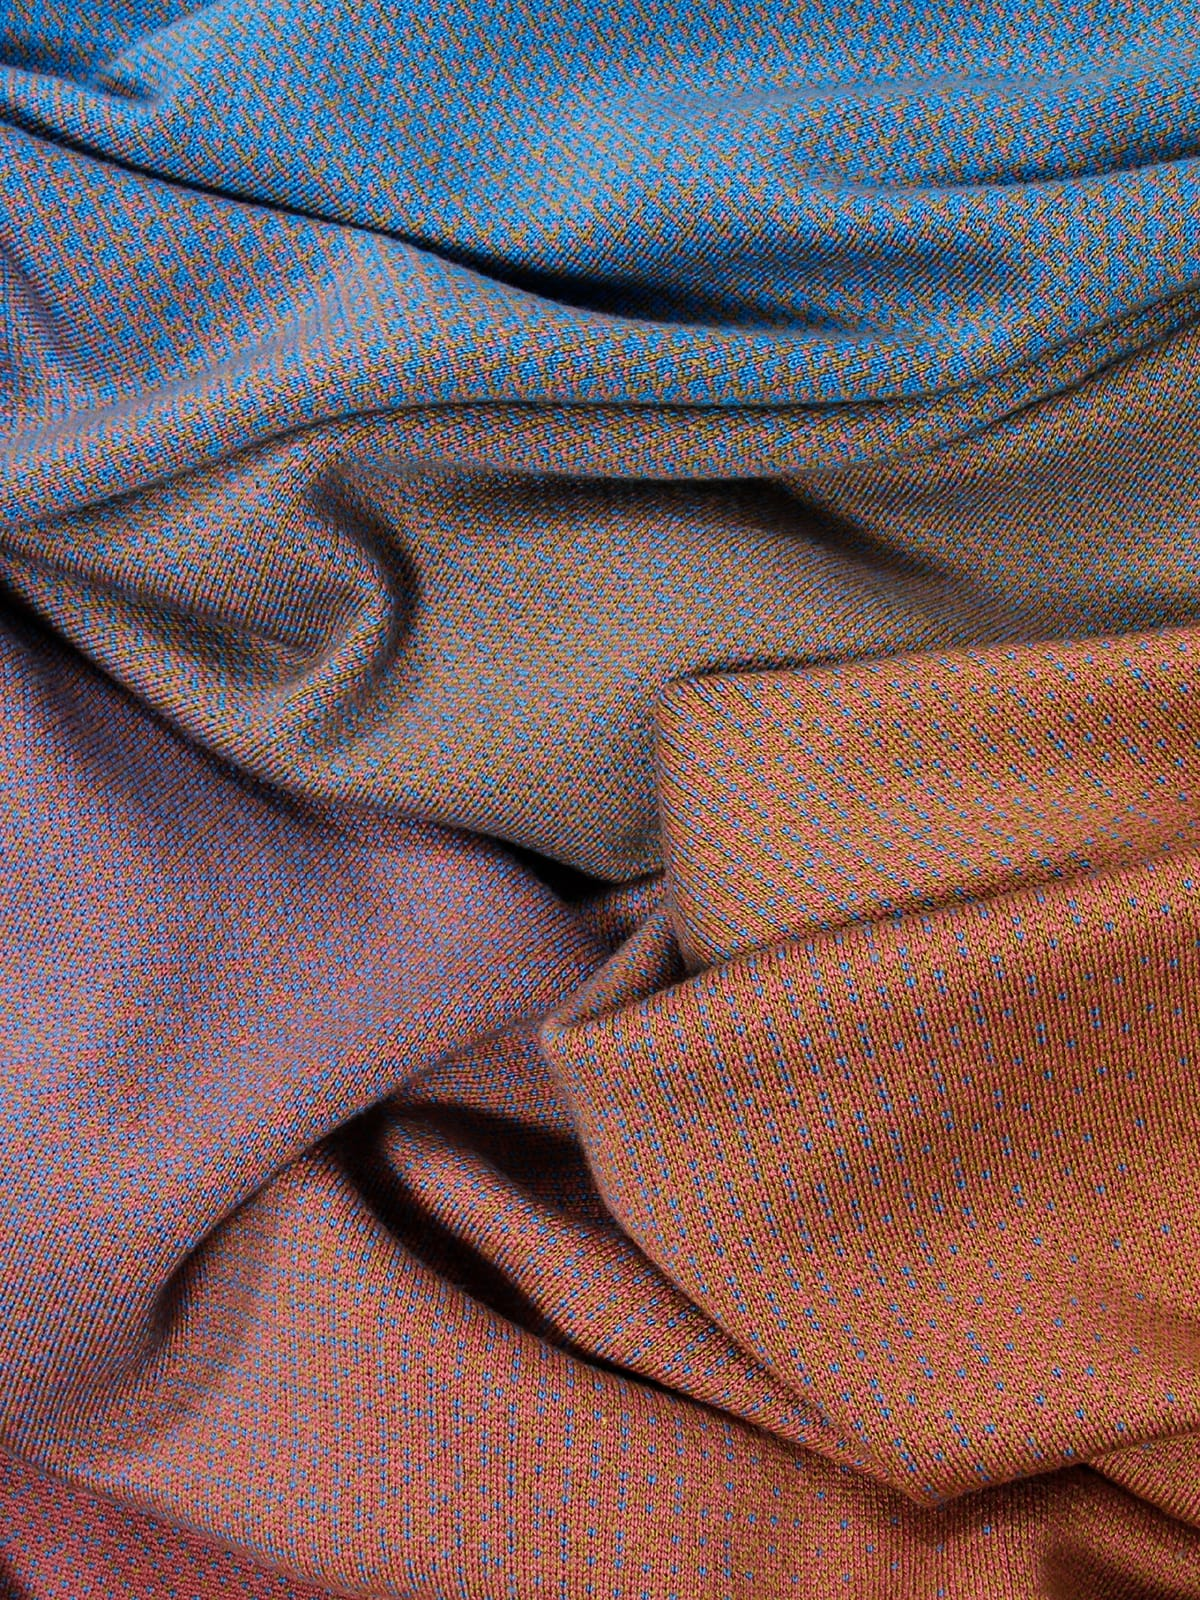 Knitted Blanket Lucca - Merino Wool detail